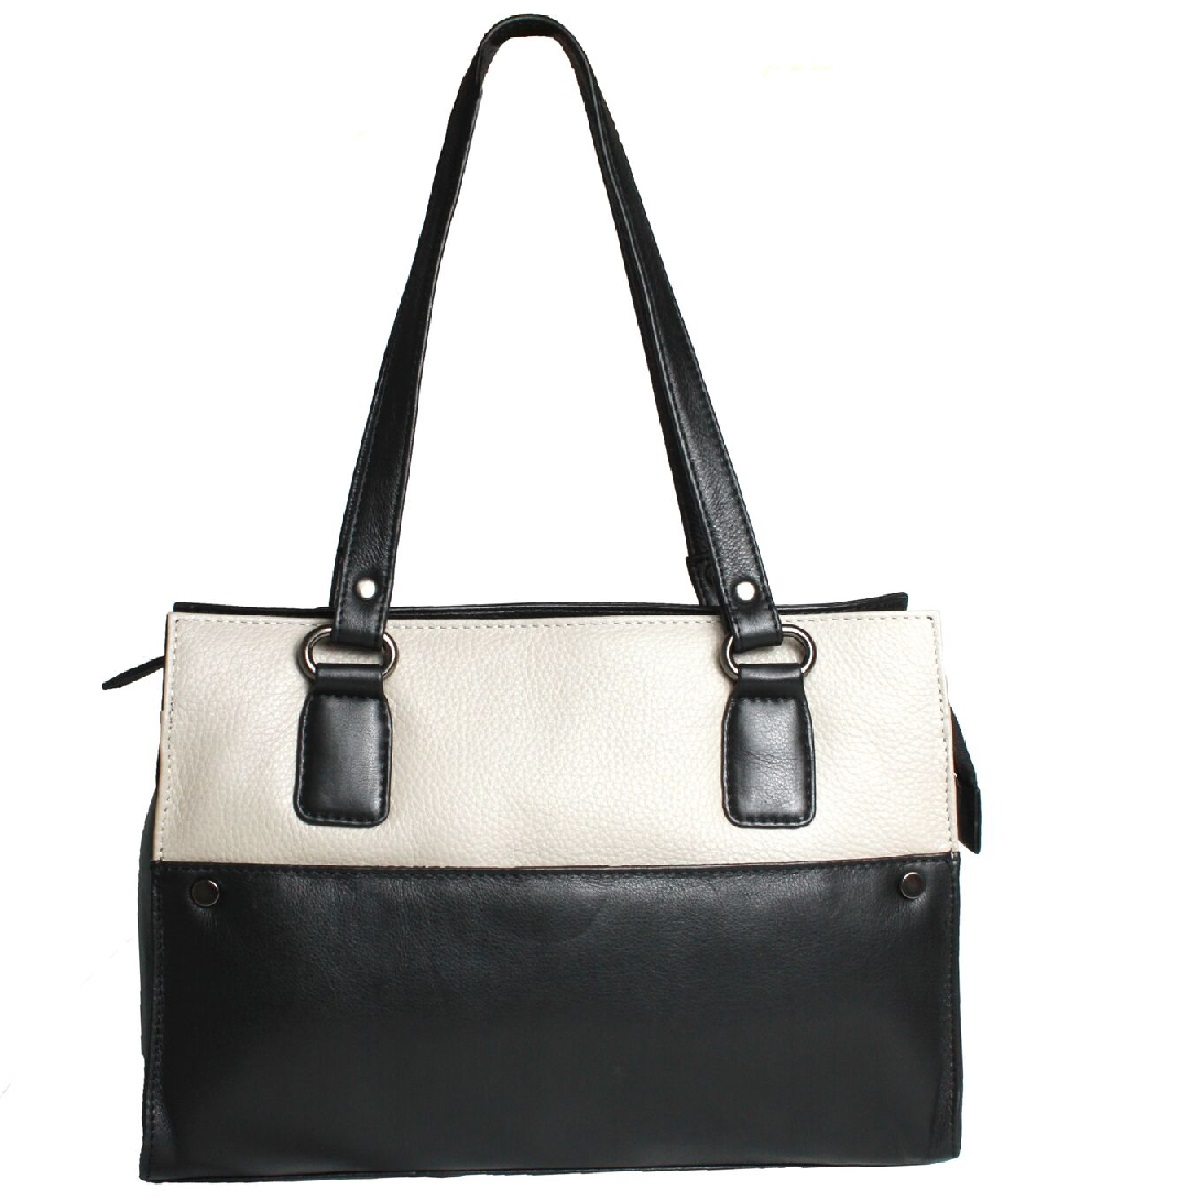 Eastern Counties Leather Womens/Ladies Joy Double Strap Handbag (One size) (Black/Stone)